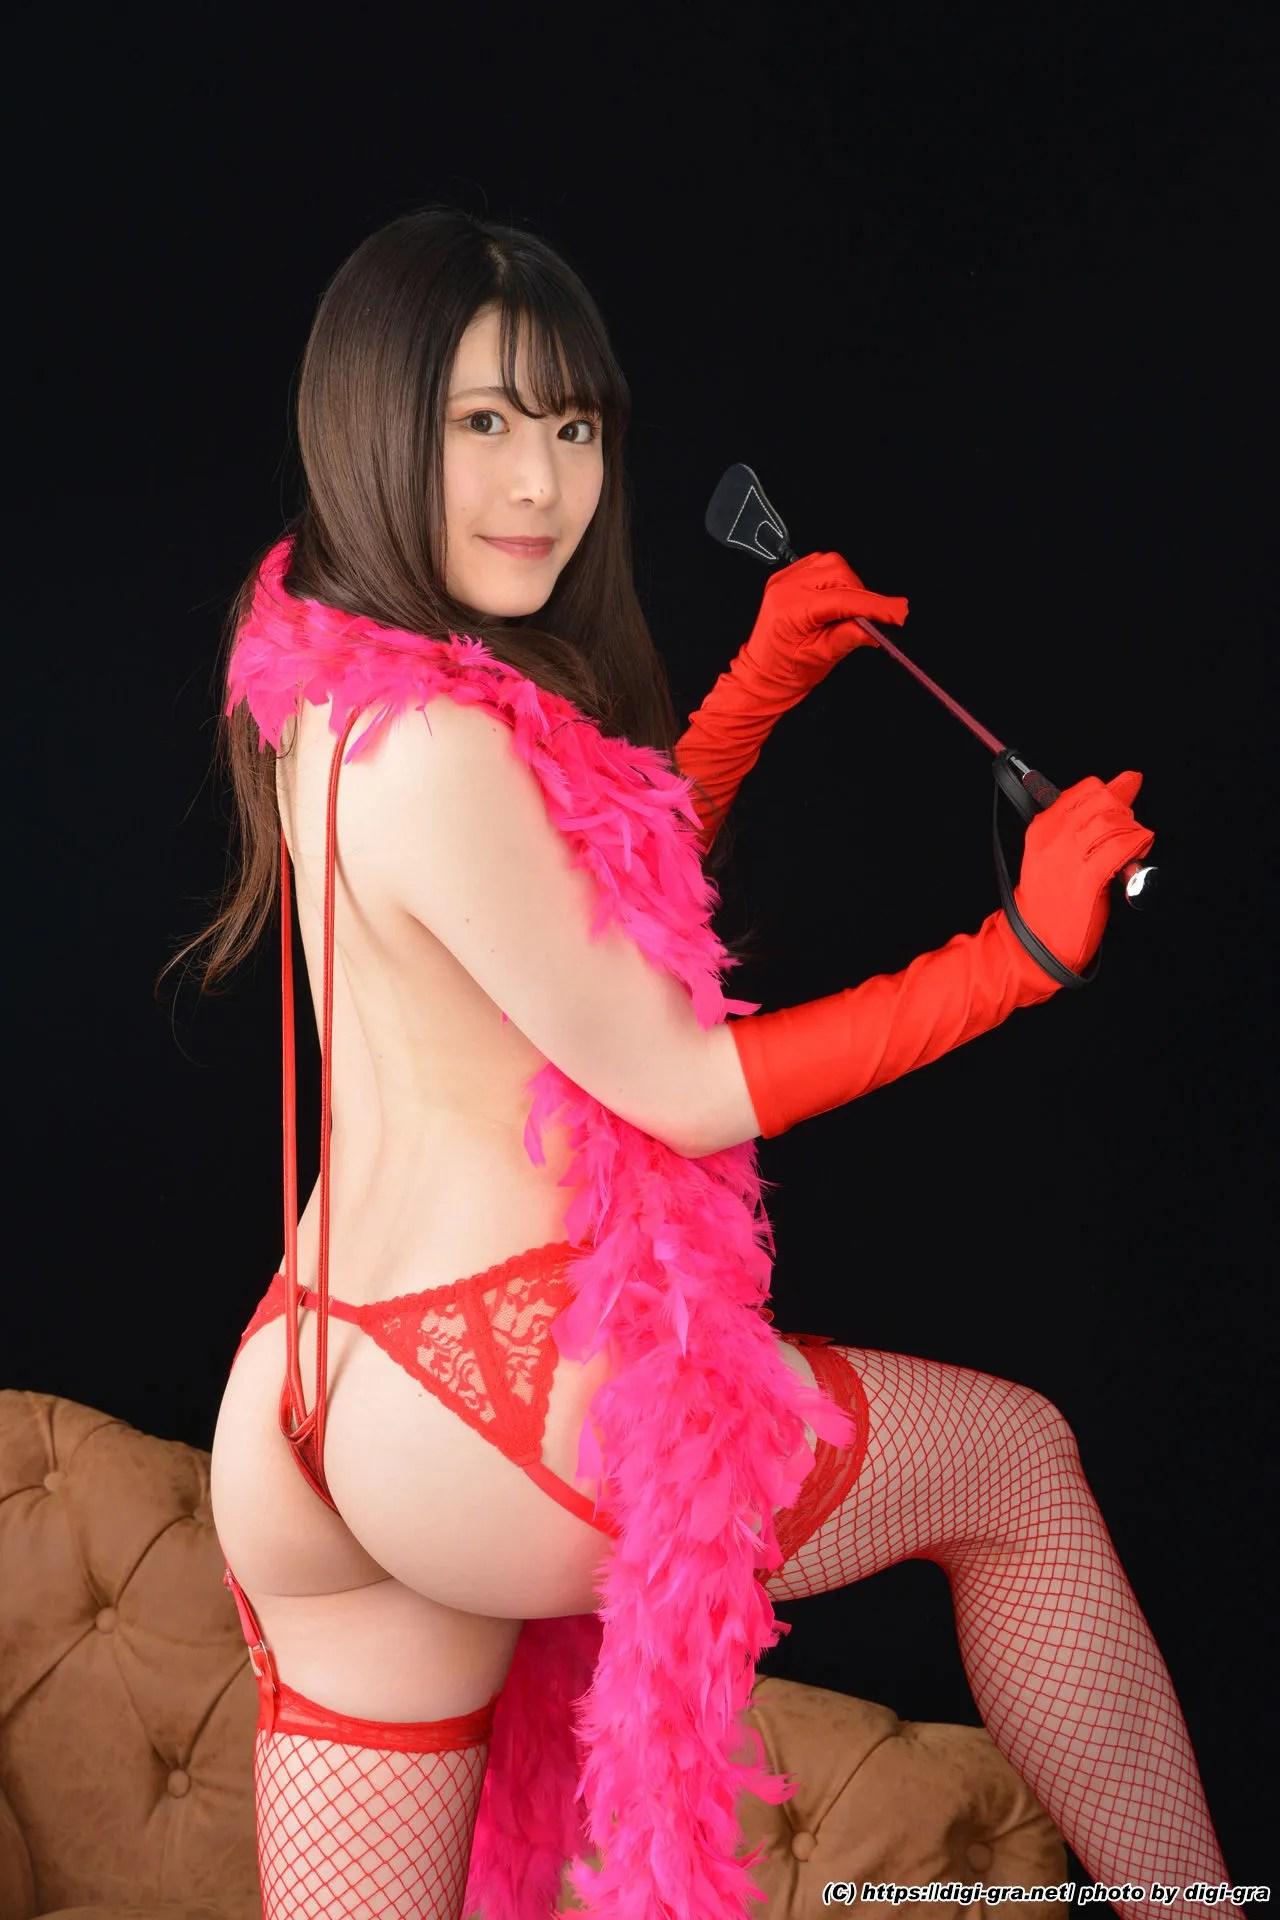 [Digi-Gra] Nanami Oozora 大空七海 Photoset 04 写真套图[70P]插图(10)